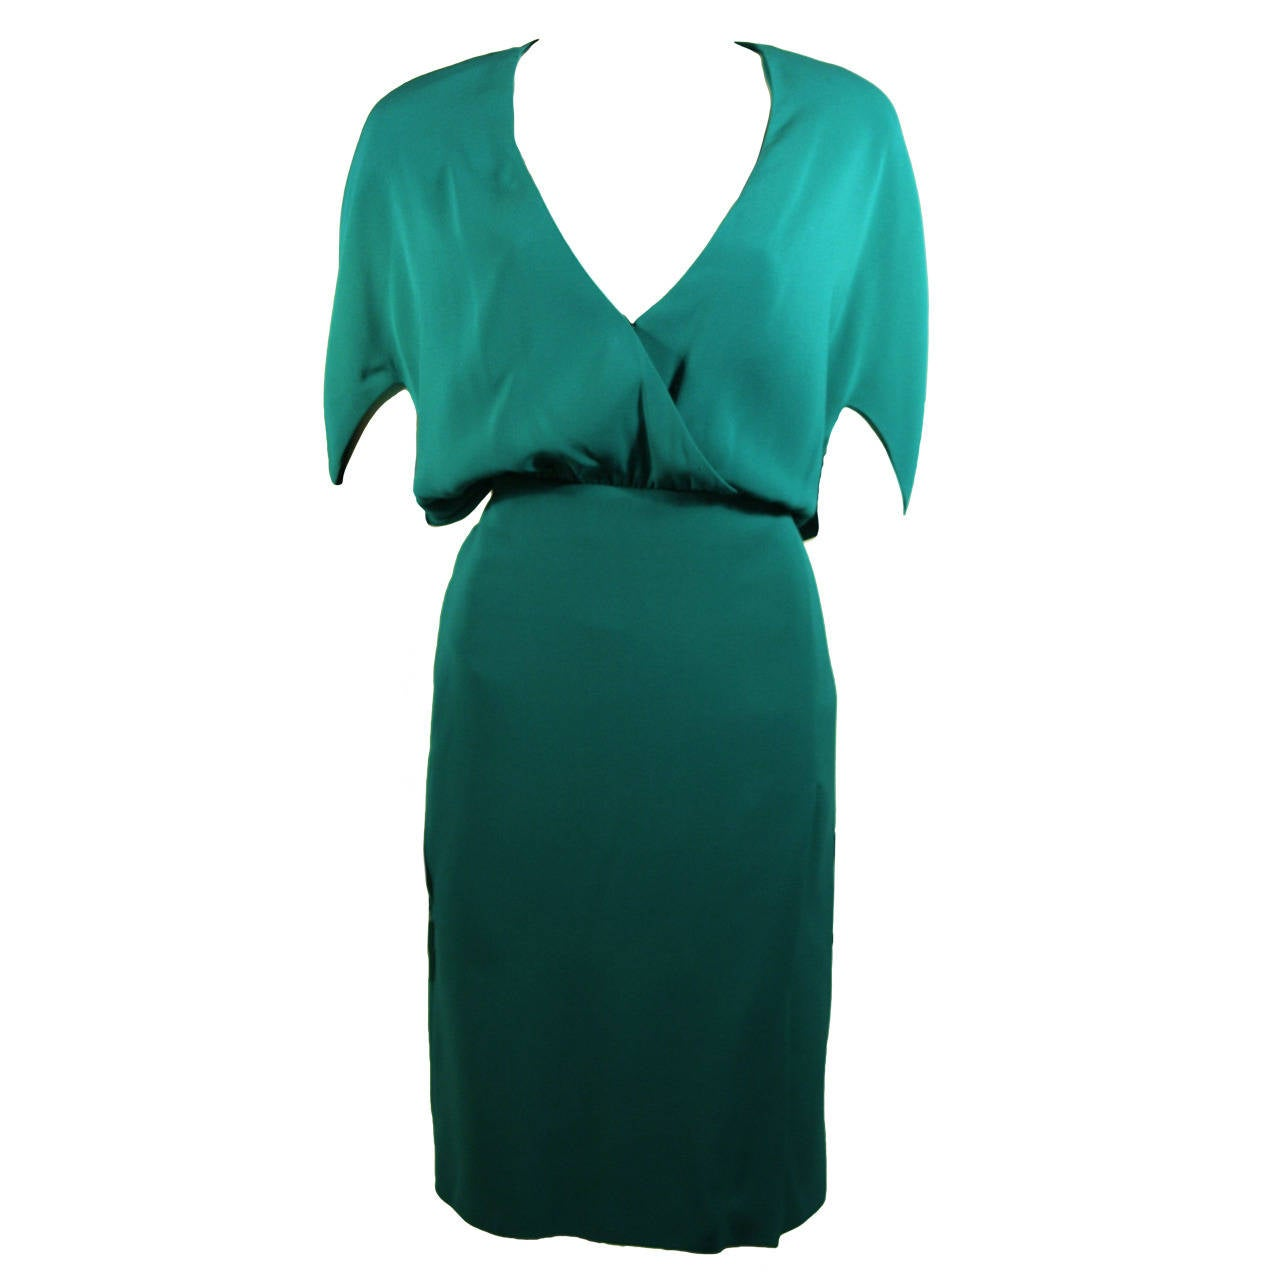 Valentino Green Silk Cocktail Dress with Plunge Neckline Size 8 For Sale